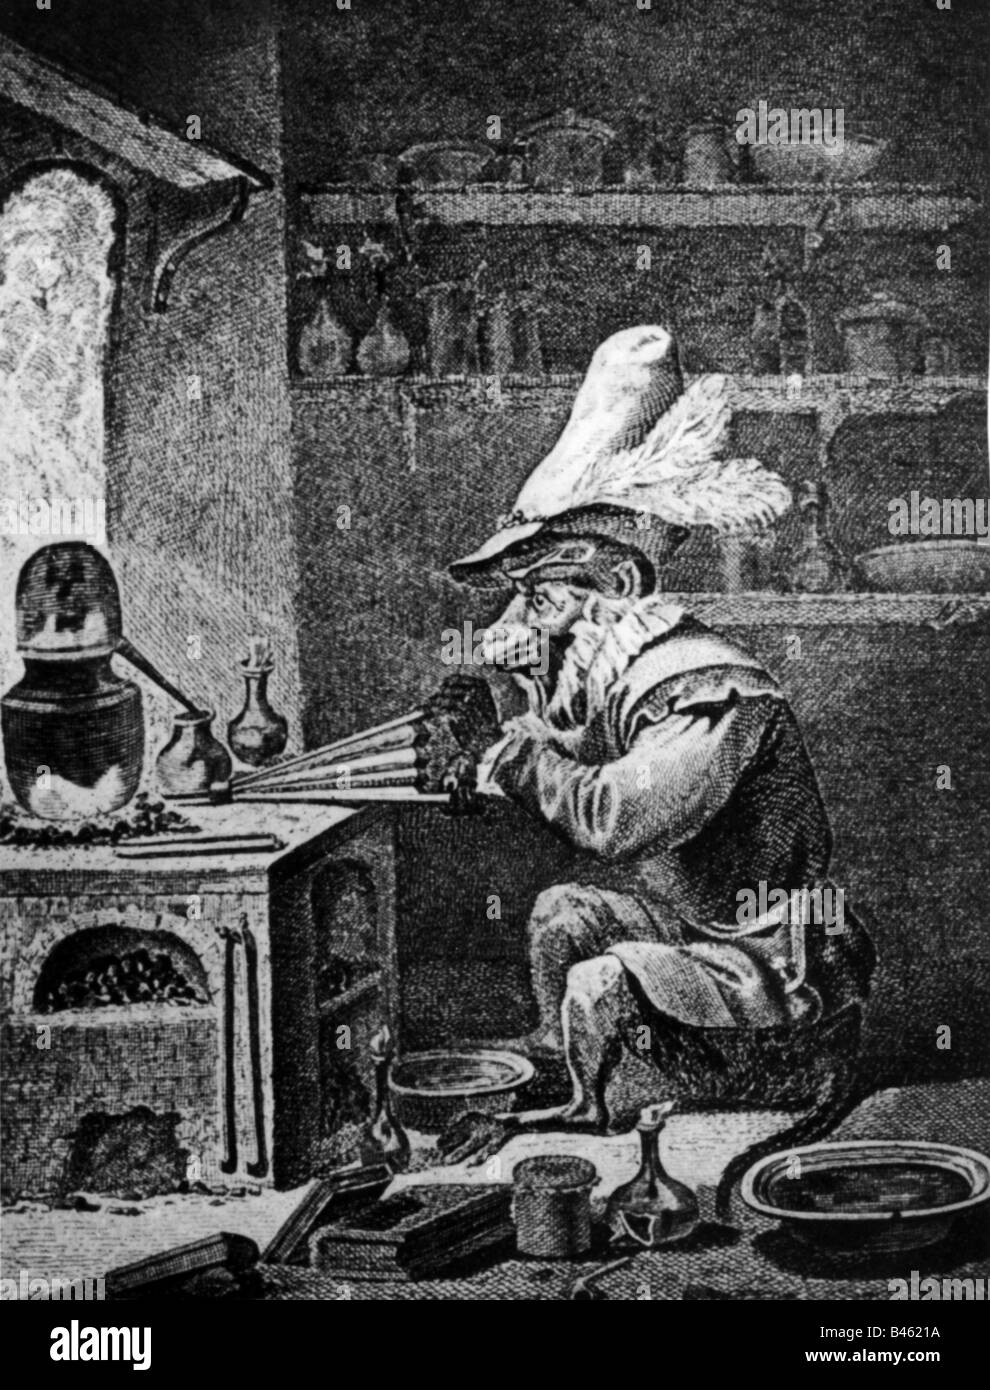 alchemy, alchemists, caricature, alchemist 'donkey',   copper engraving, 17th century, , Additional-Rights - Stock Image